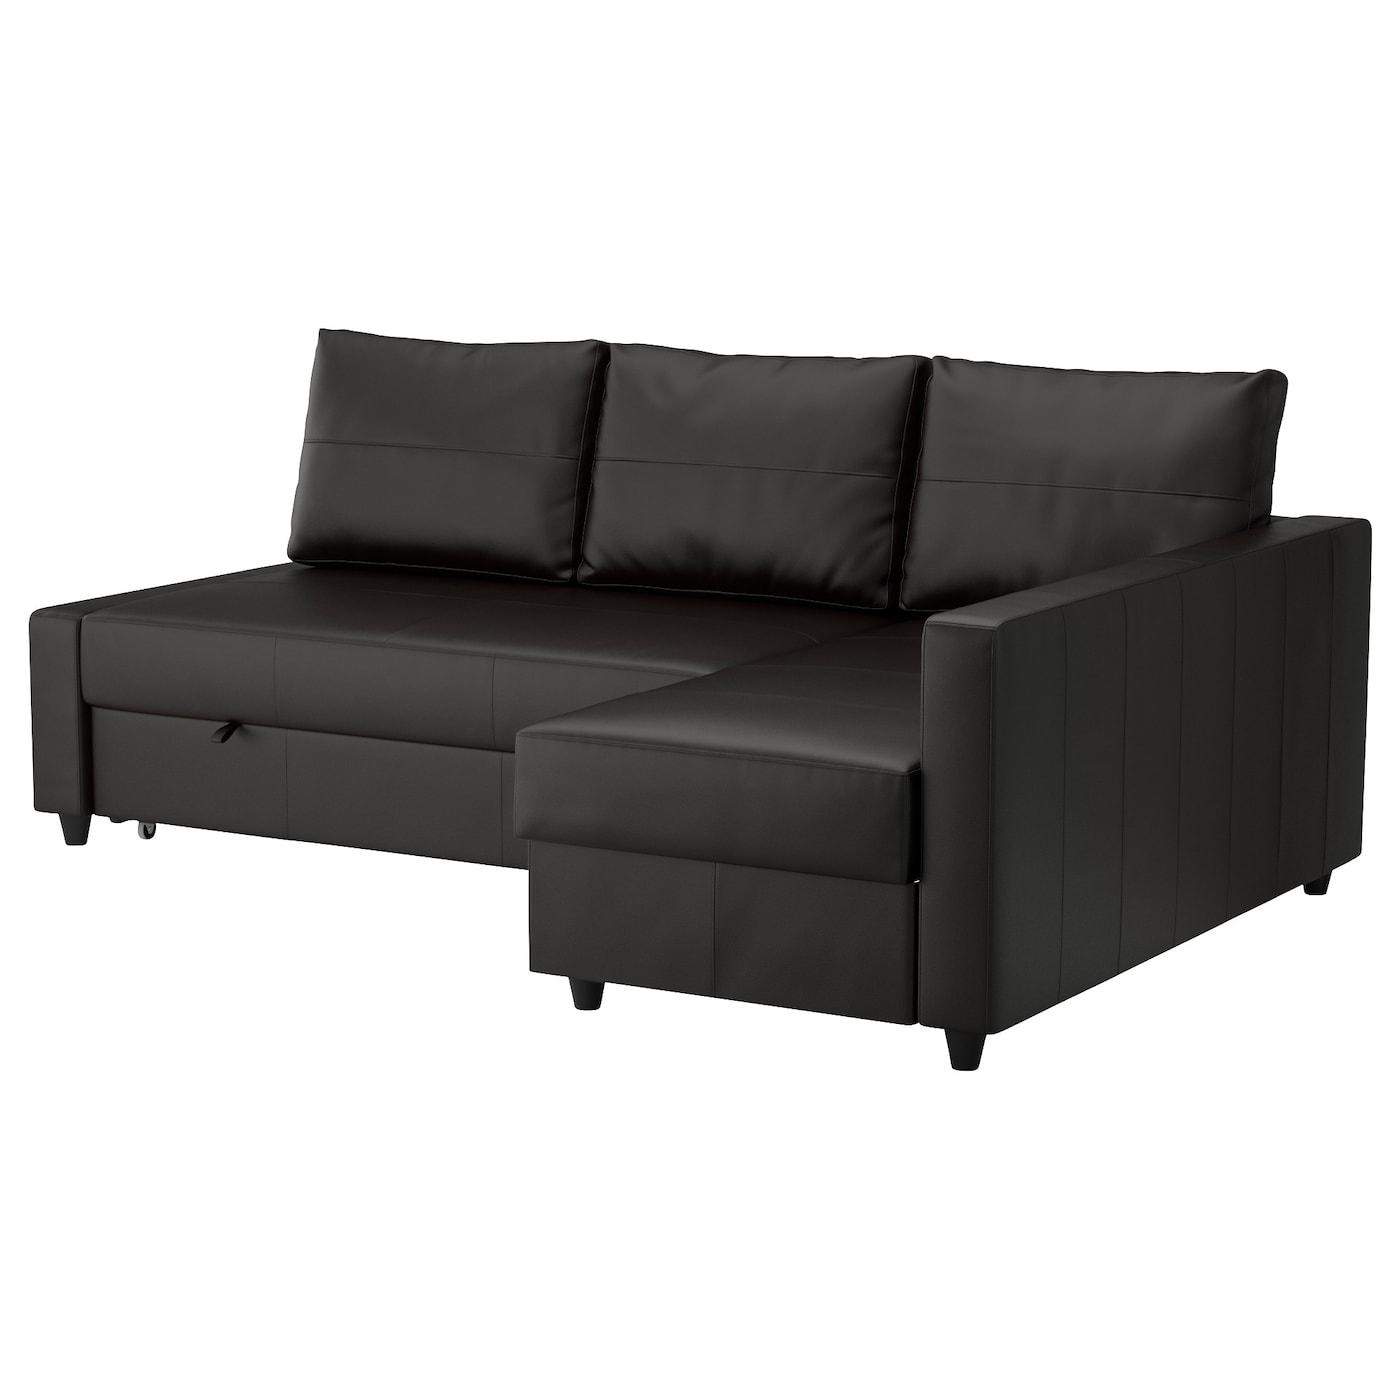 Astounding Friheten Corner Sofa Bed With Storage Bomstad Black Interior Design Ideas Clesiryabchikinfo